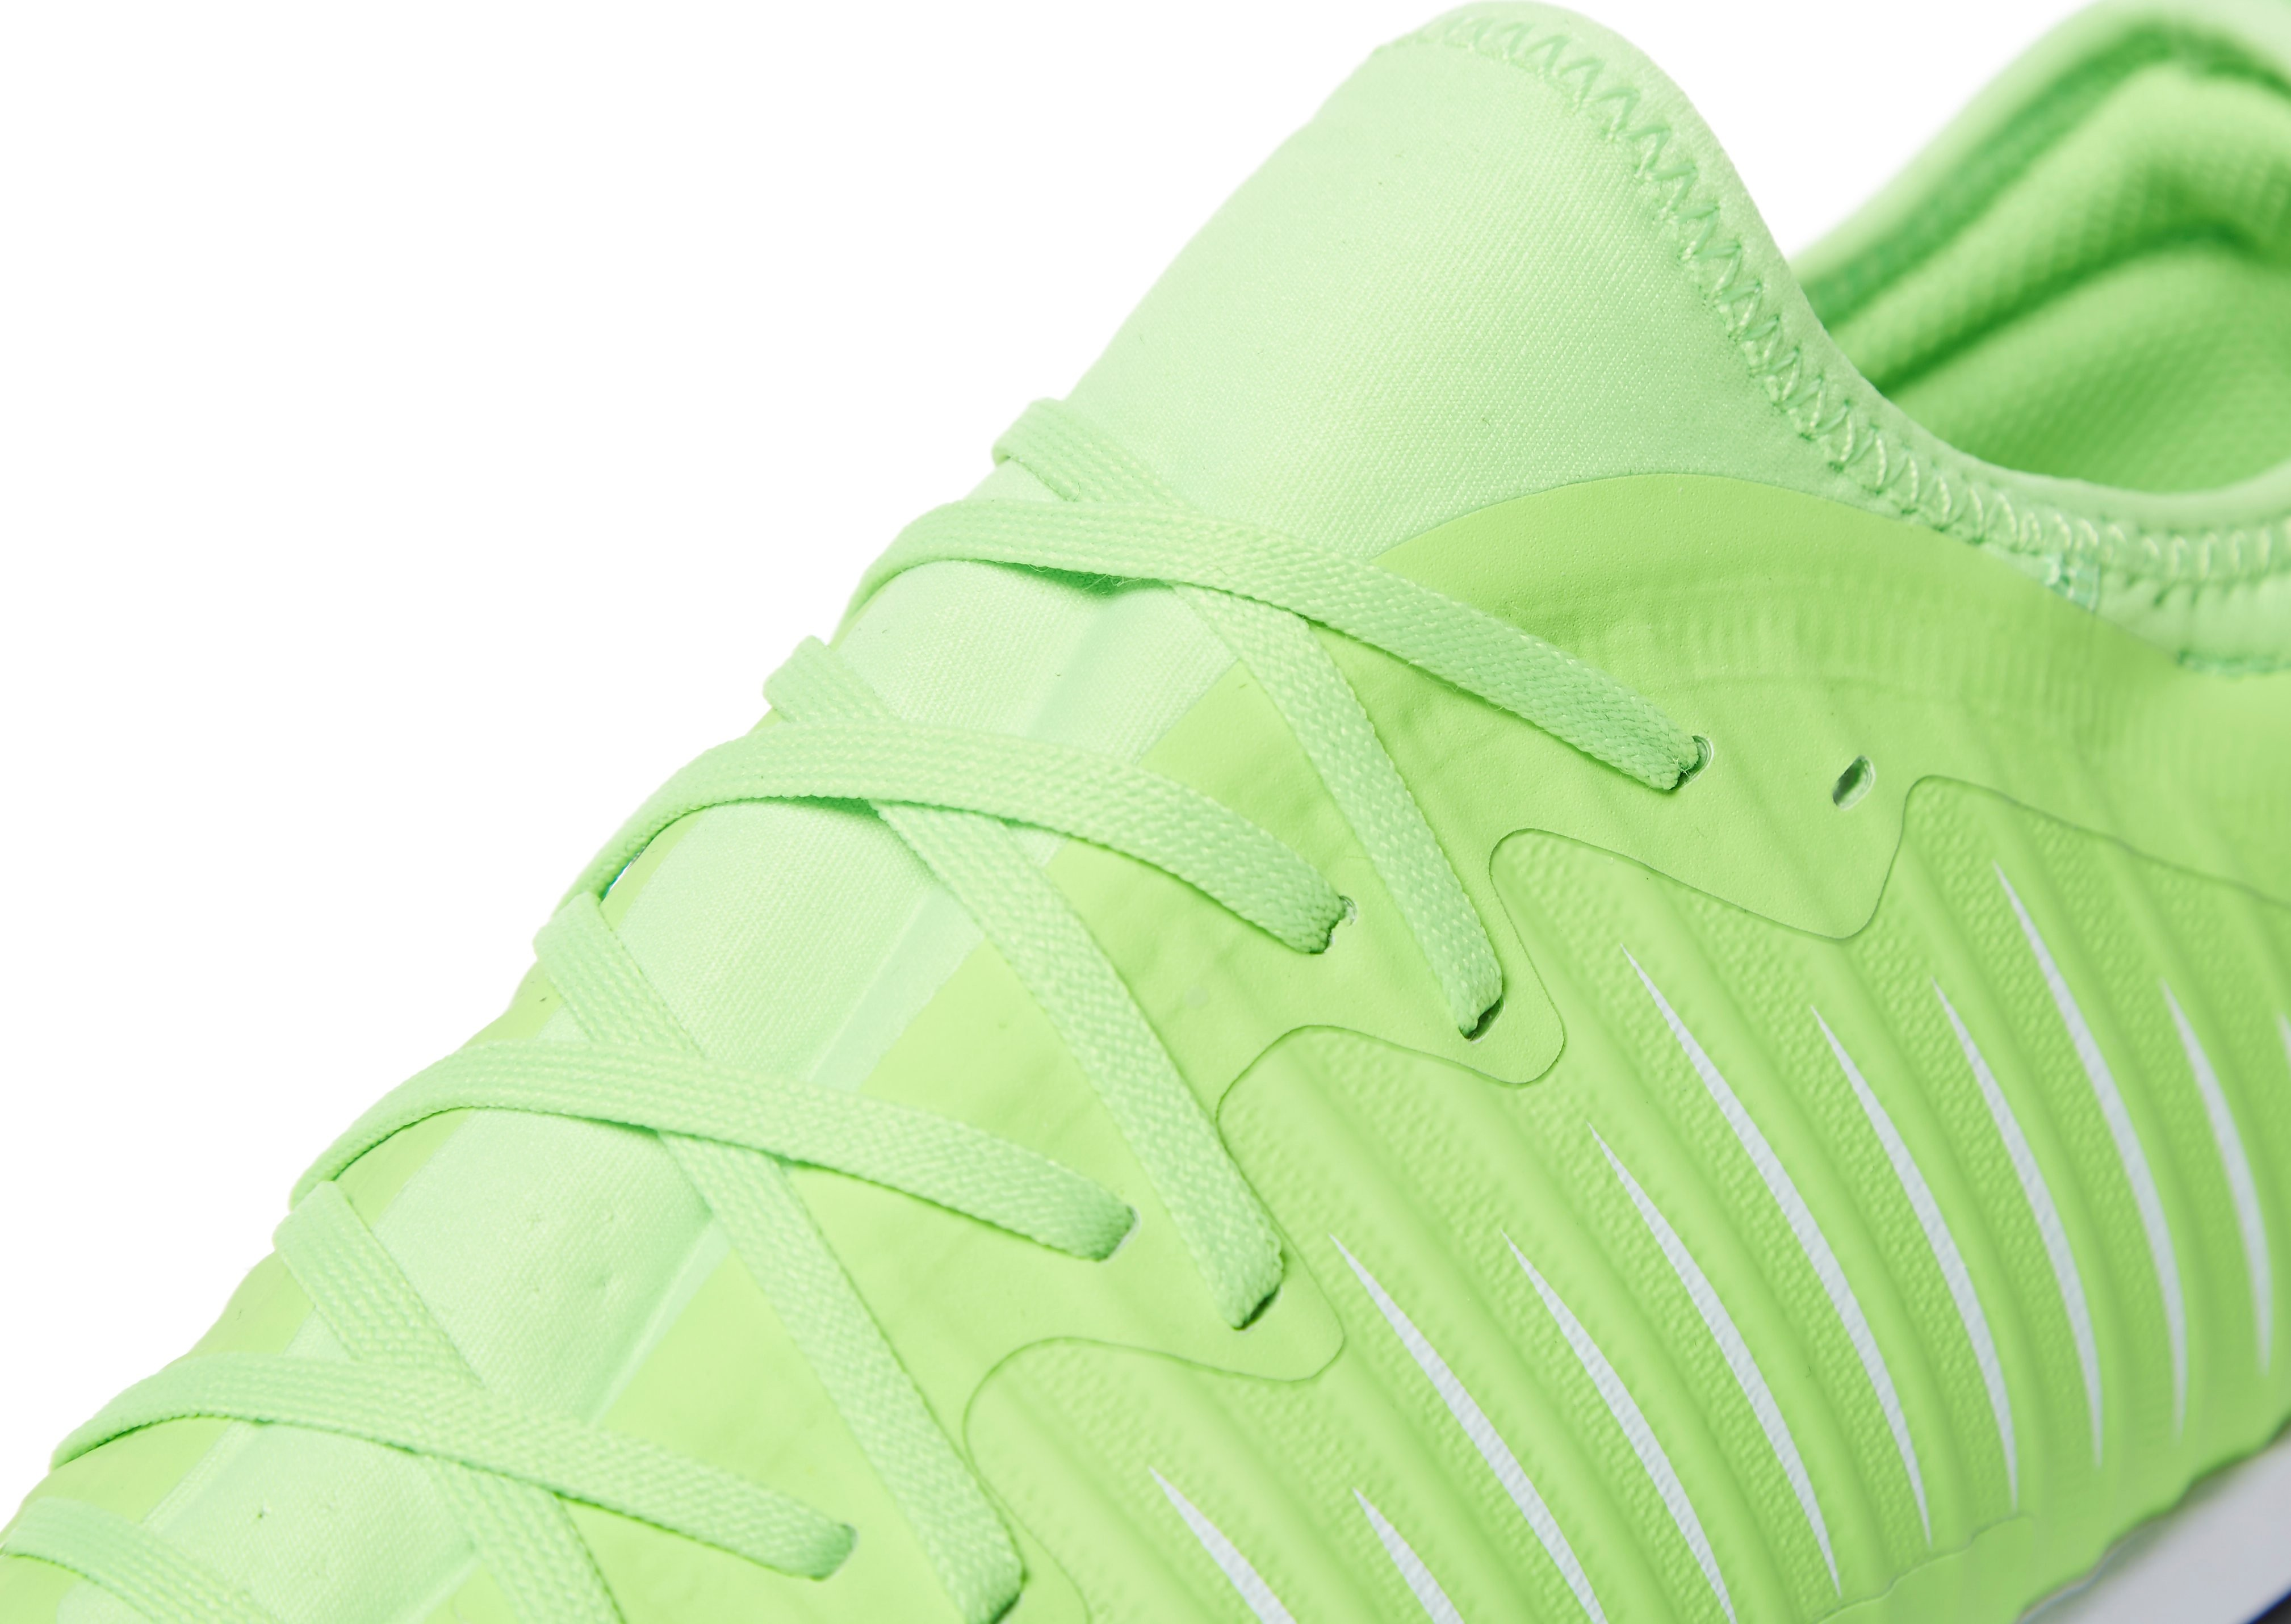 Nike Radiation Flare MercurialX Finale II TF